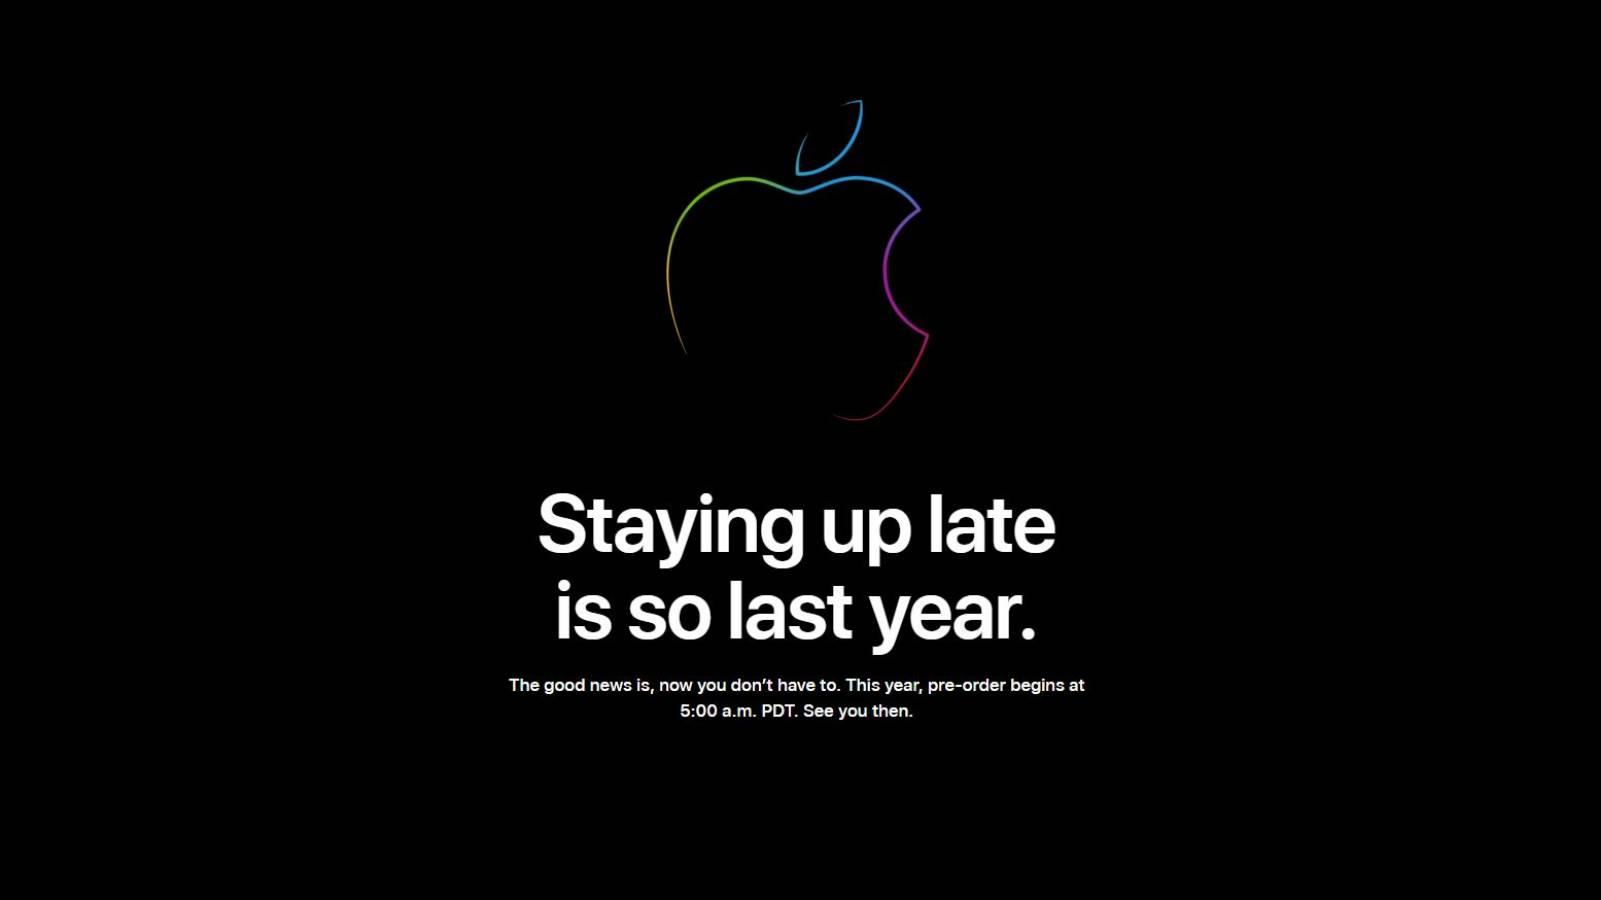 Precomenzile pentru iPhone 11 INCEP AZI, mai TARZIU decat de Obicei